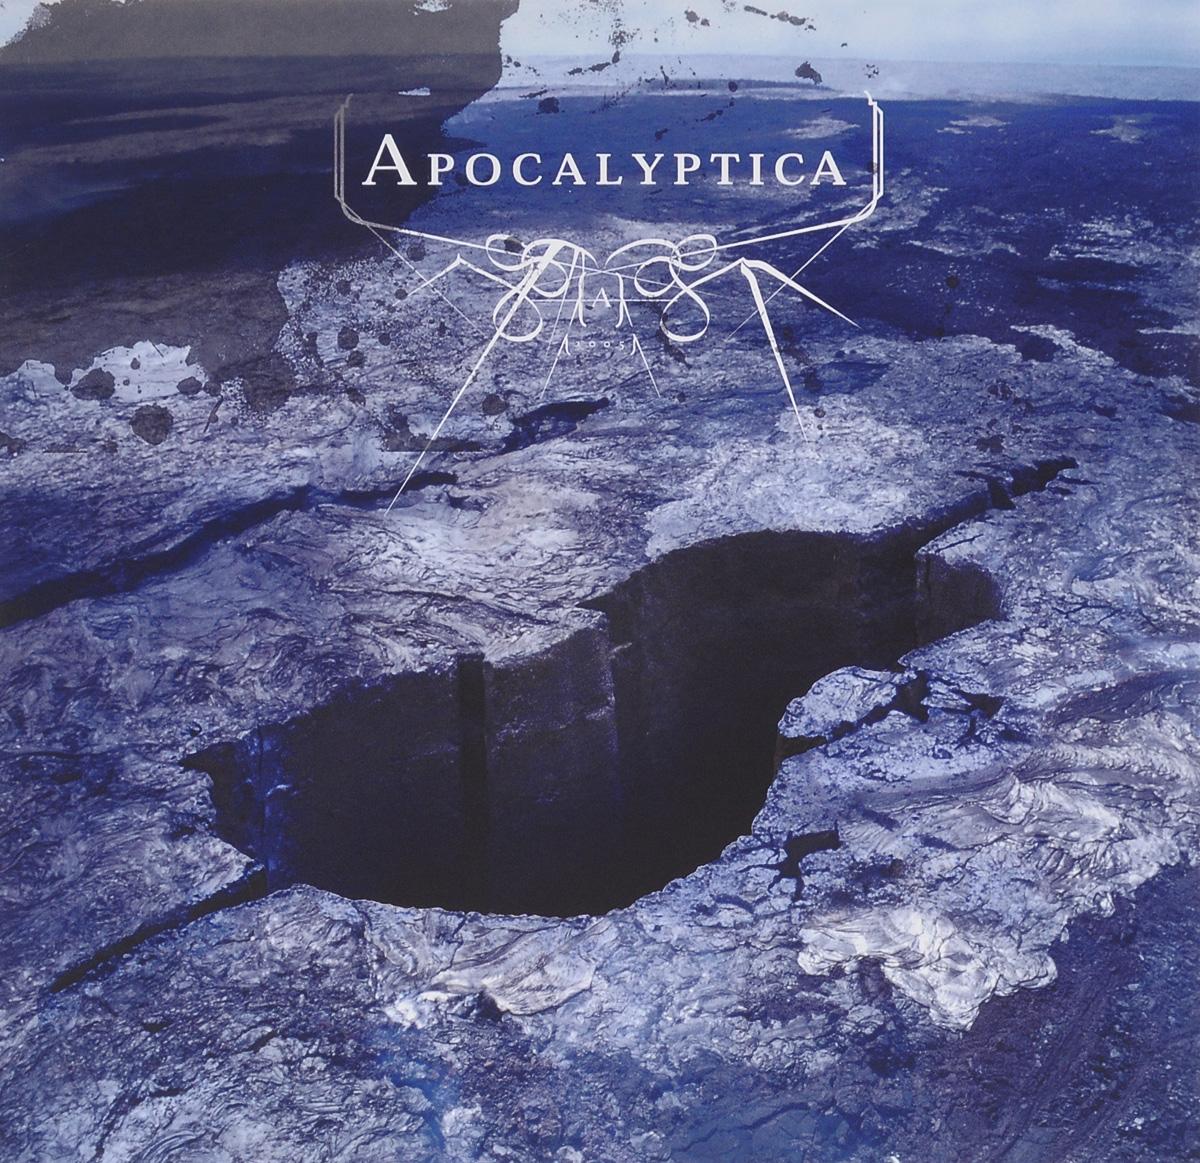 Apocalyptica Apocalyptica. Apocalyptica (2 LP + CD) ���������� �������������� ���������� �������������� �������� �������������������� ������������������������ ���������������� 1 2 3 ������������ 2 cd